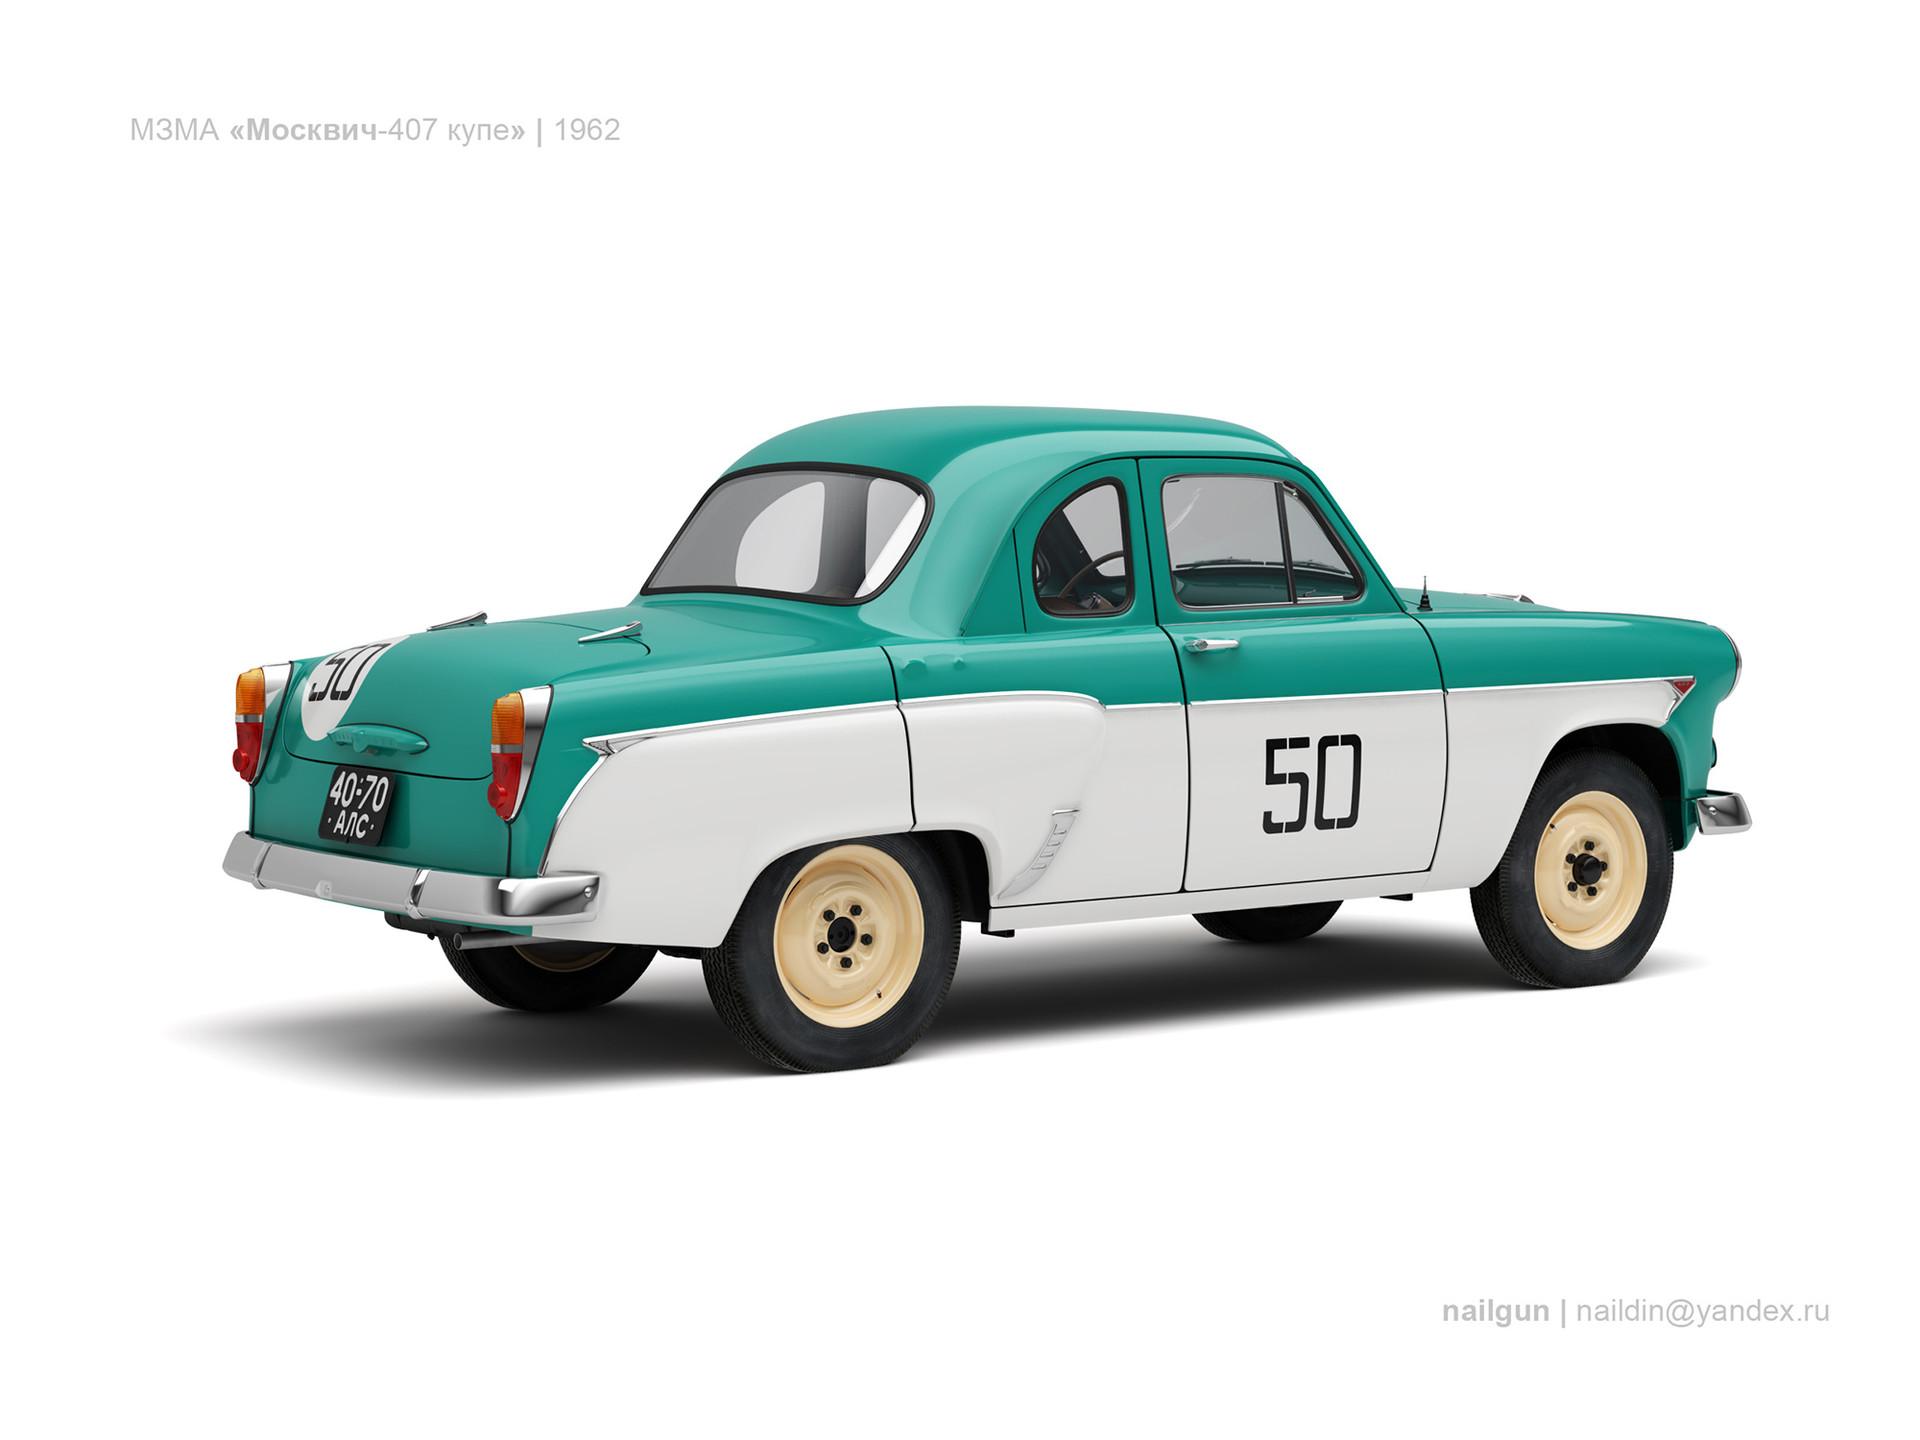 Nail khusnutdinov ussr moskvich 407 coupe 1962 1